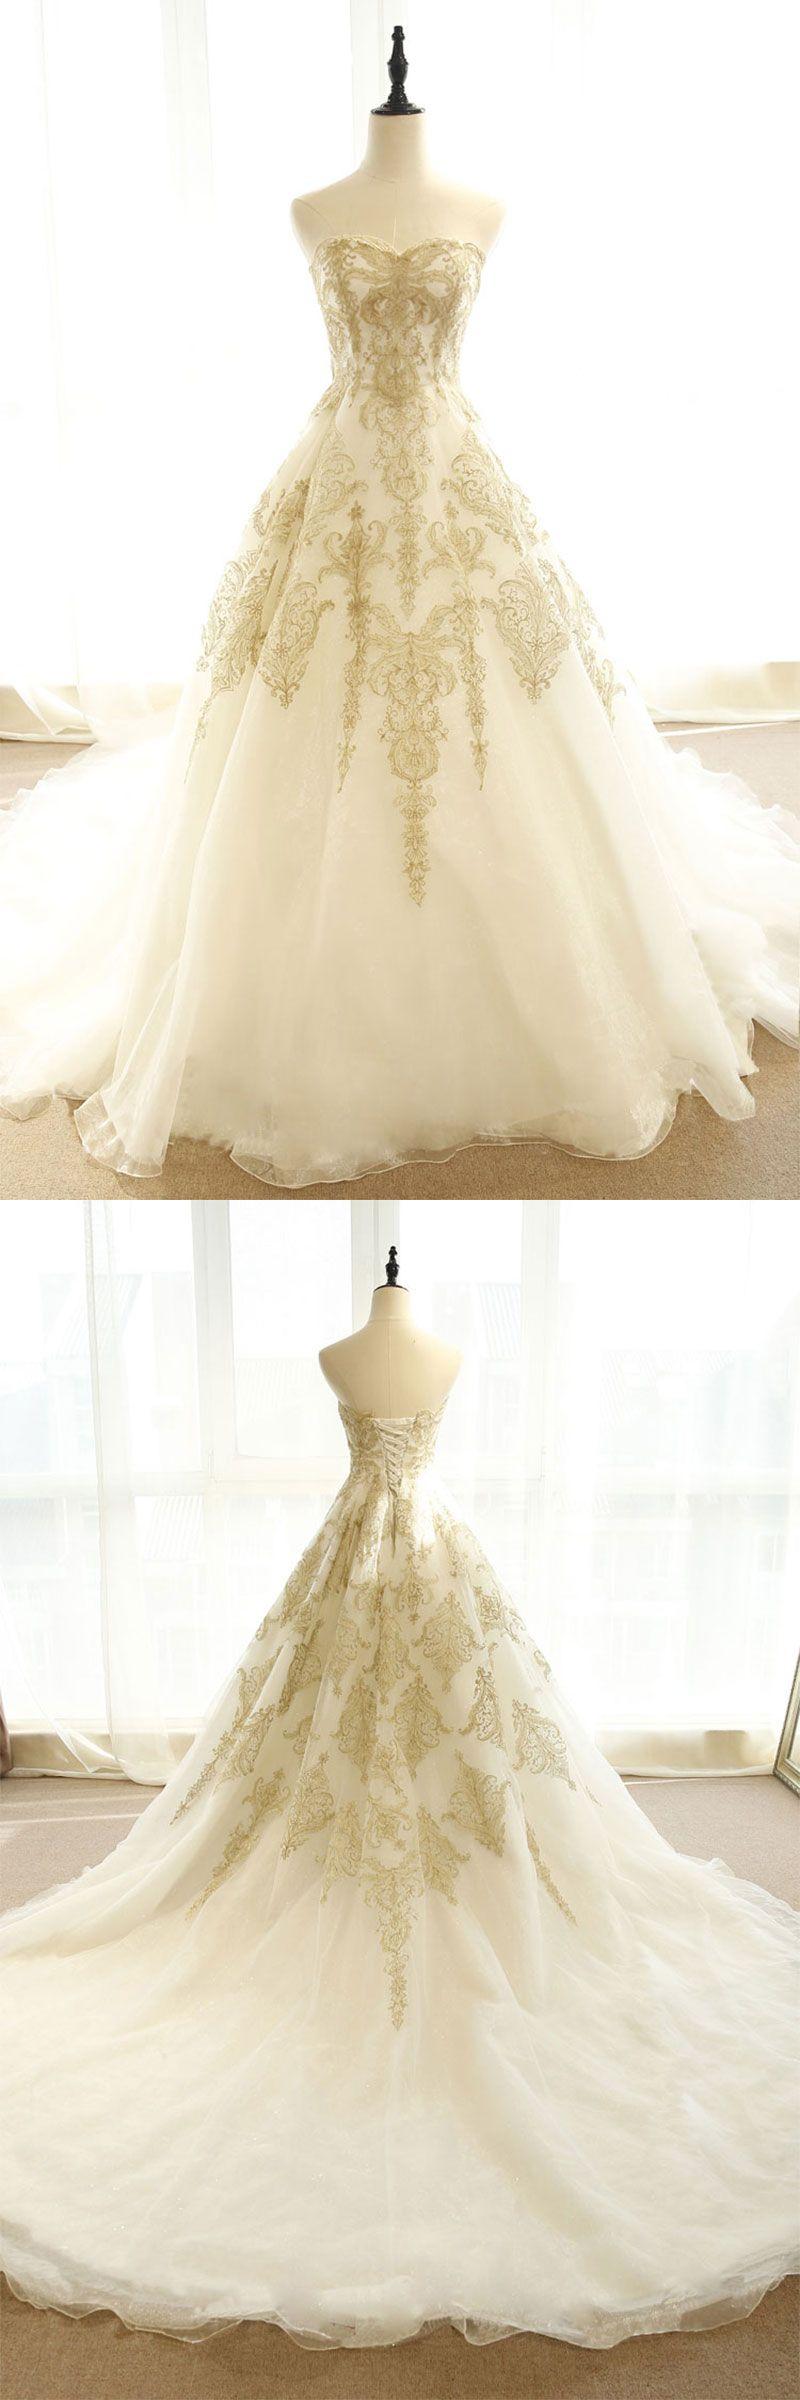 Lace wedding dress champagne  Champagne lace long wedding dress champagne bridal dress  Wedding